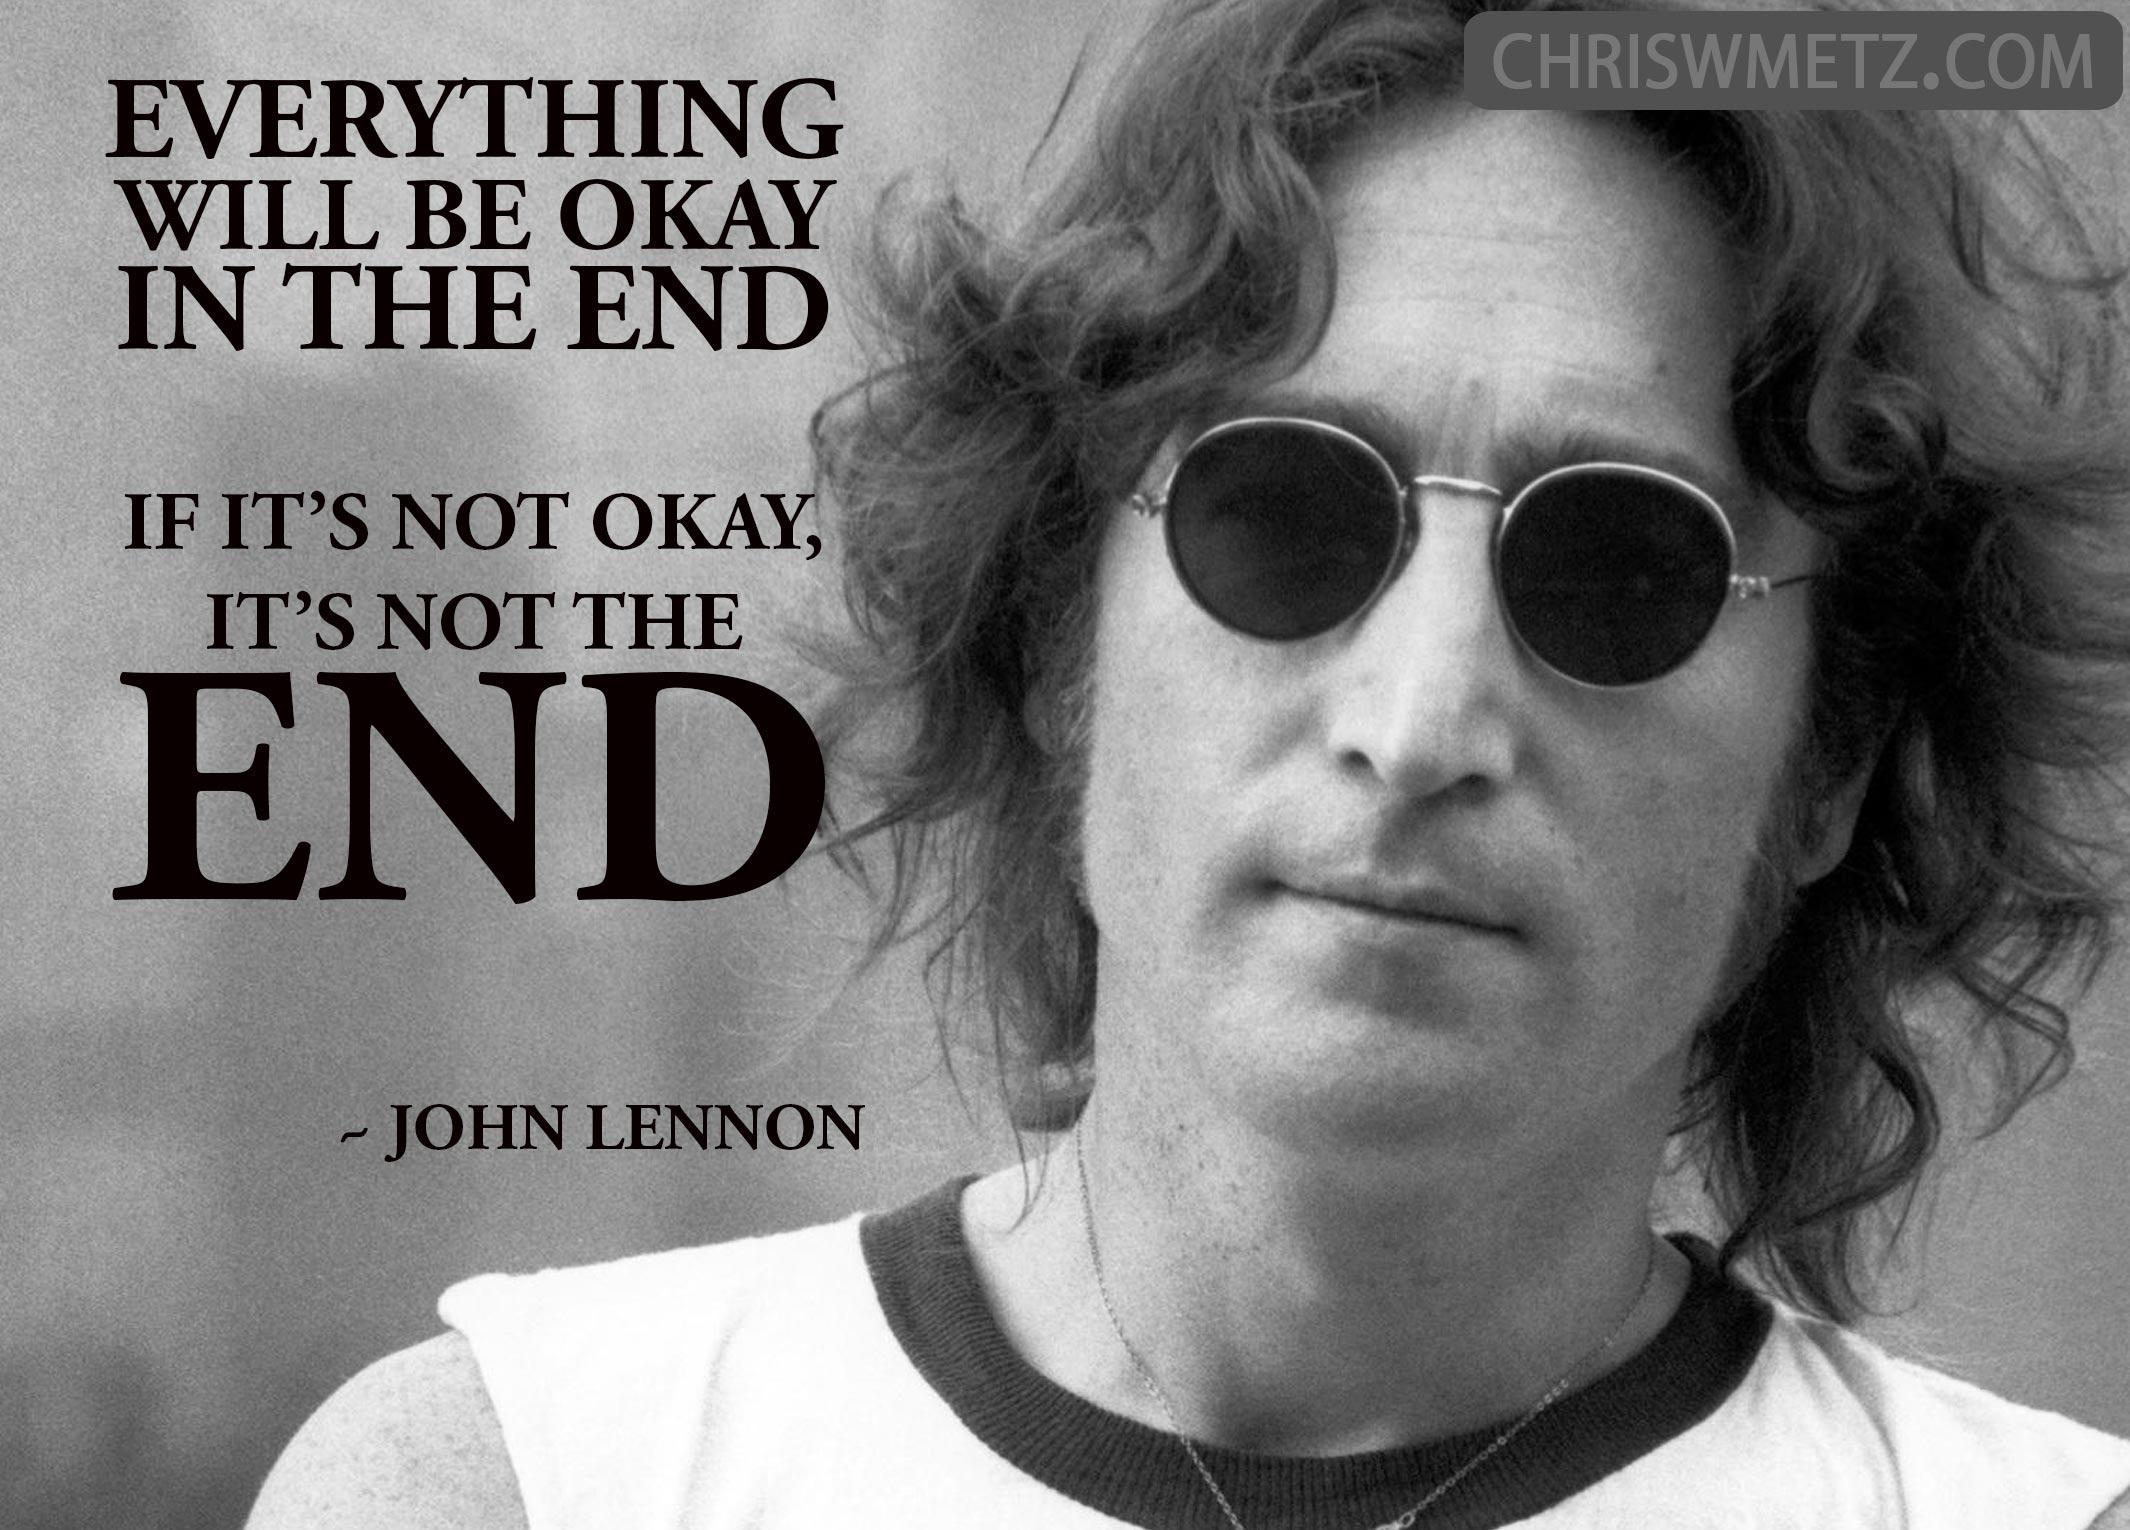 Fear Quote 12 John Lennon 12 8 1980 Chris W Metz